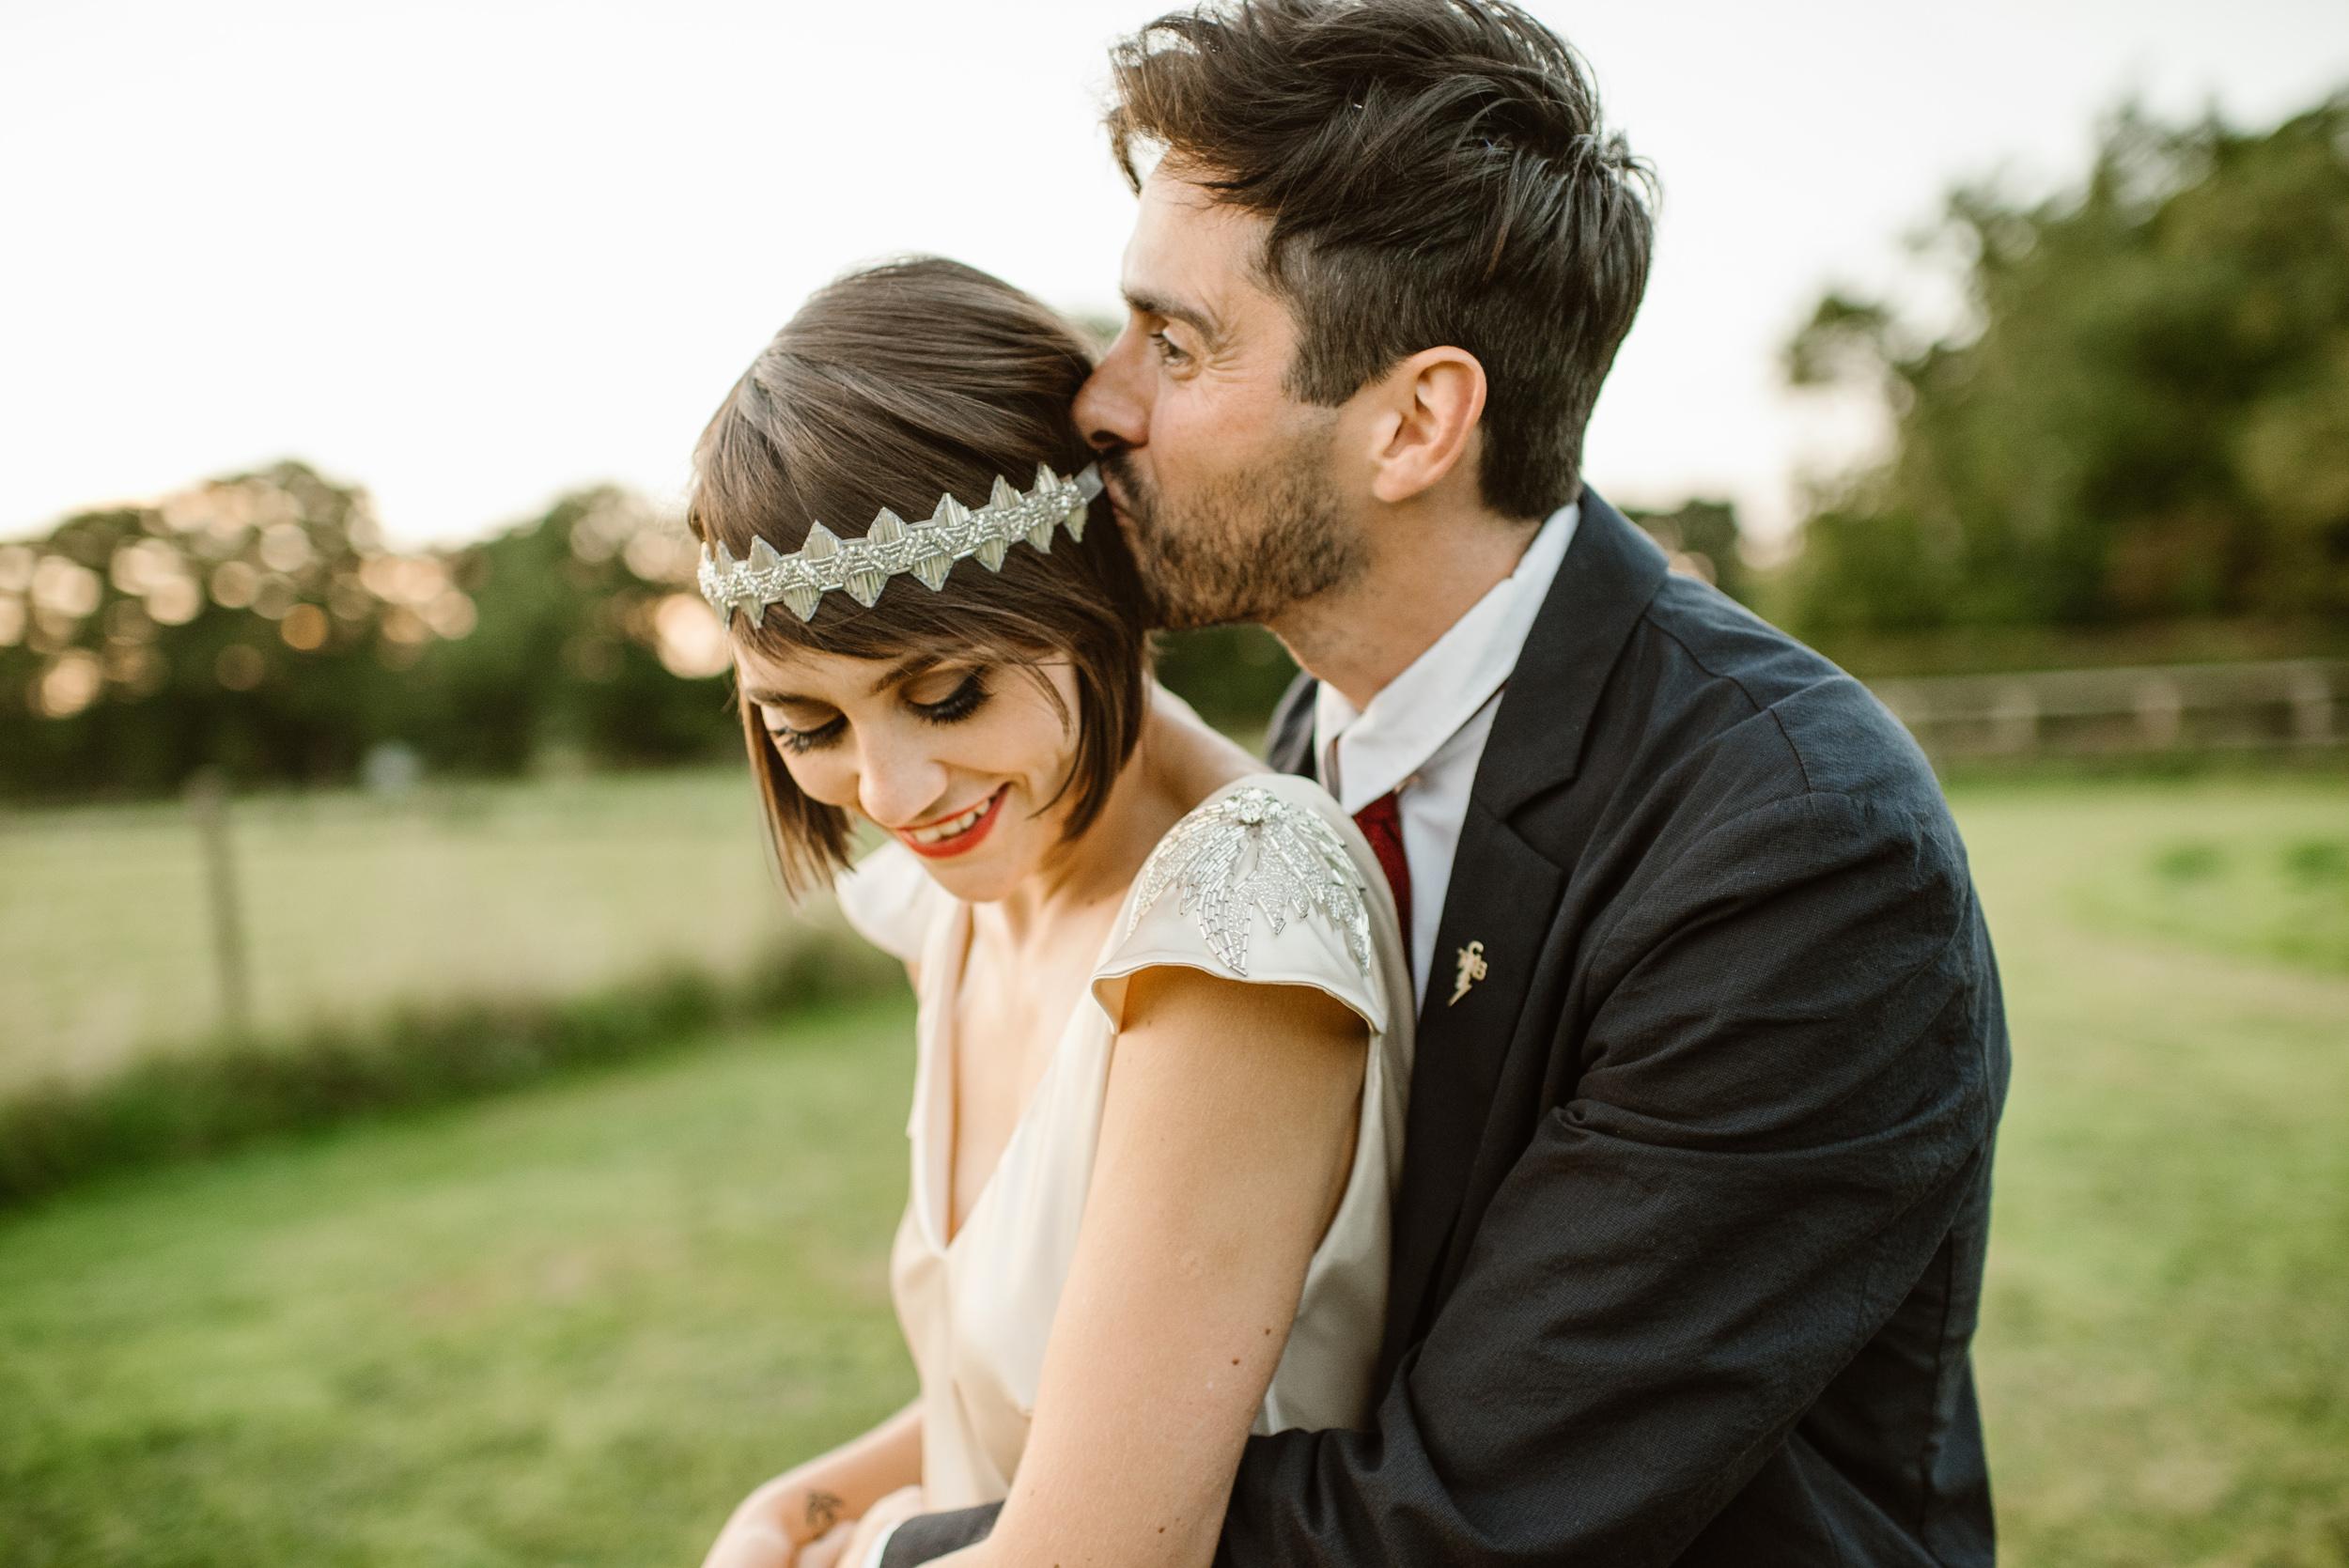 Ro-Kate-Beaumont-bias-cut-silk-wedding-gown-back-garden-wedding-by-Ellie-Gillard-26.jpg